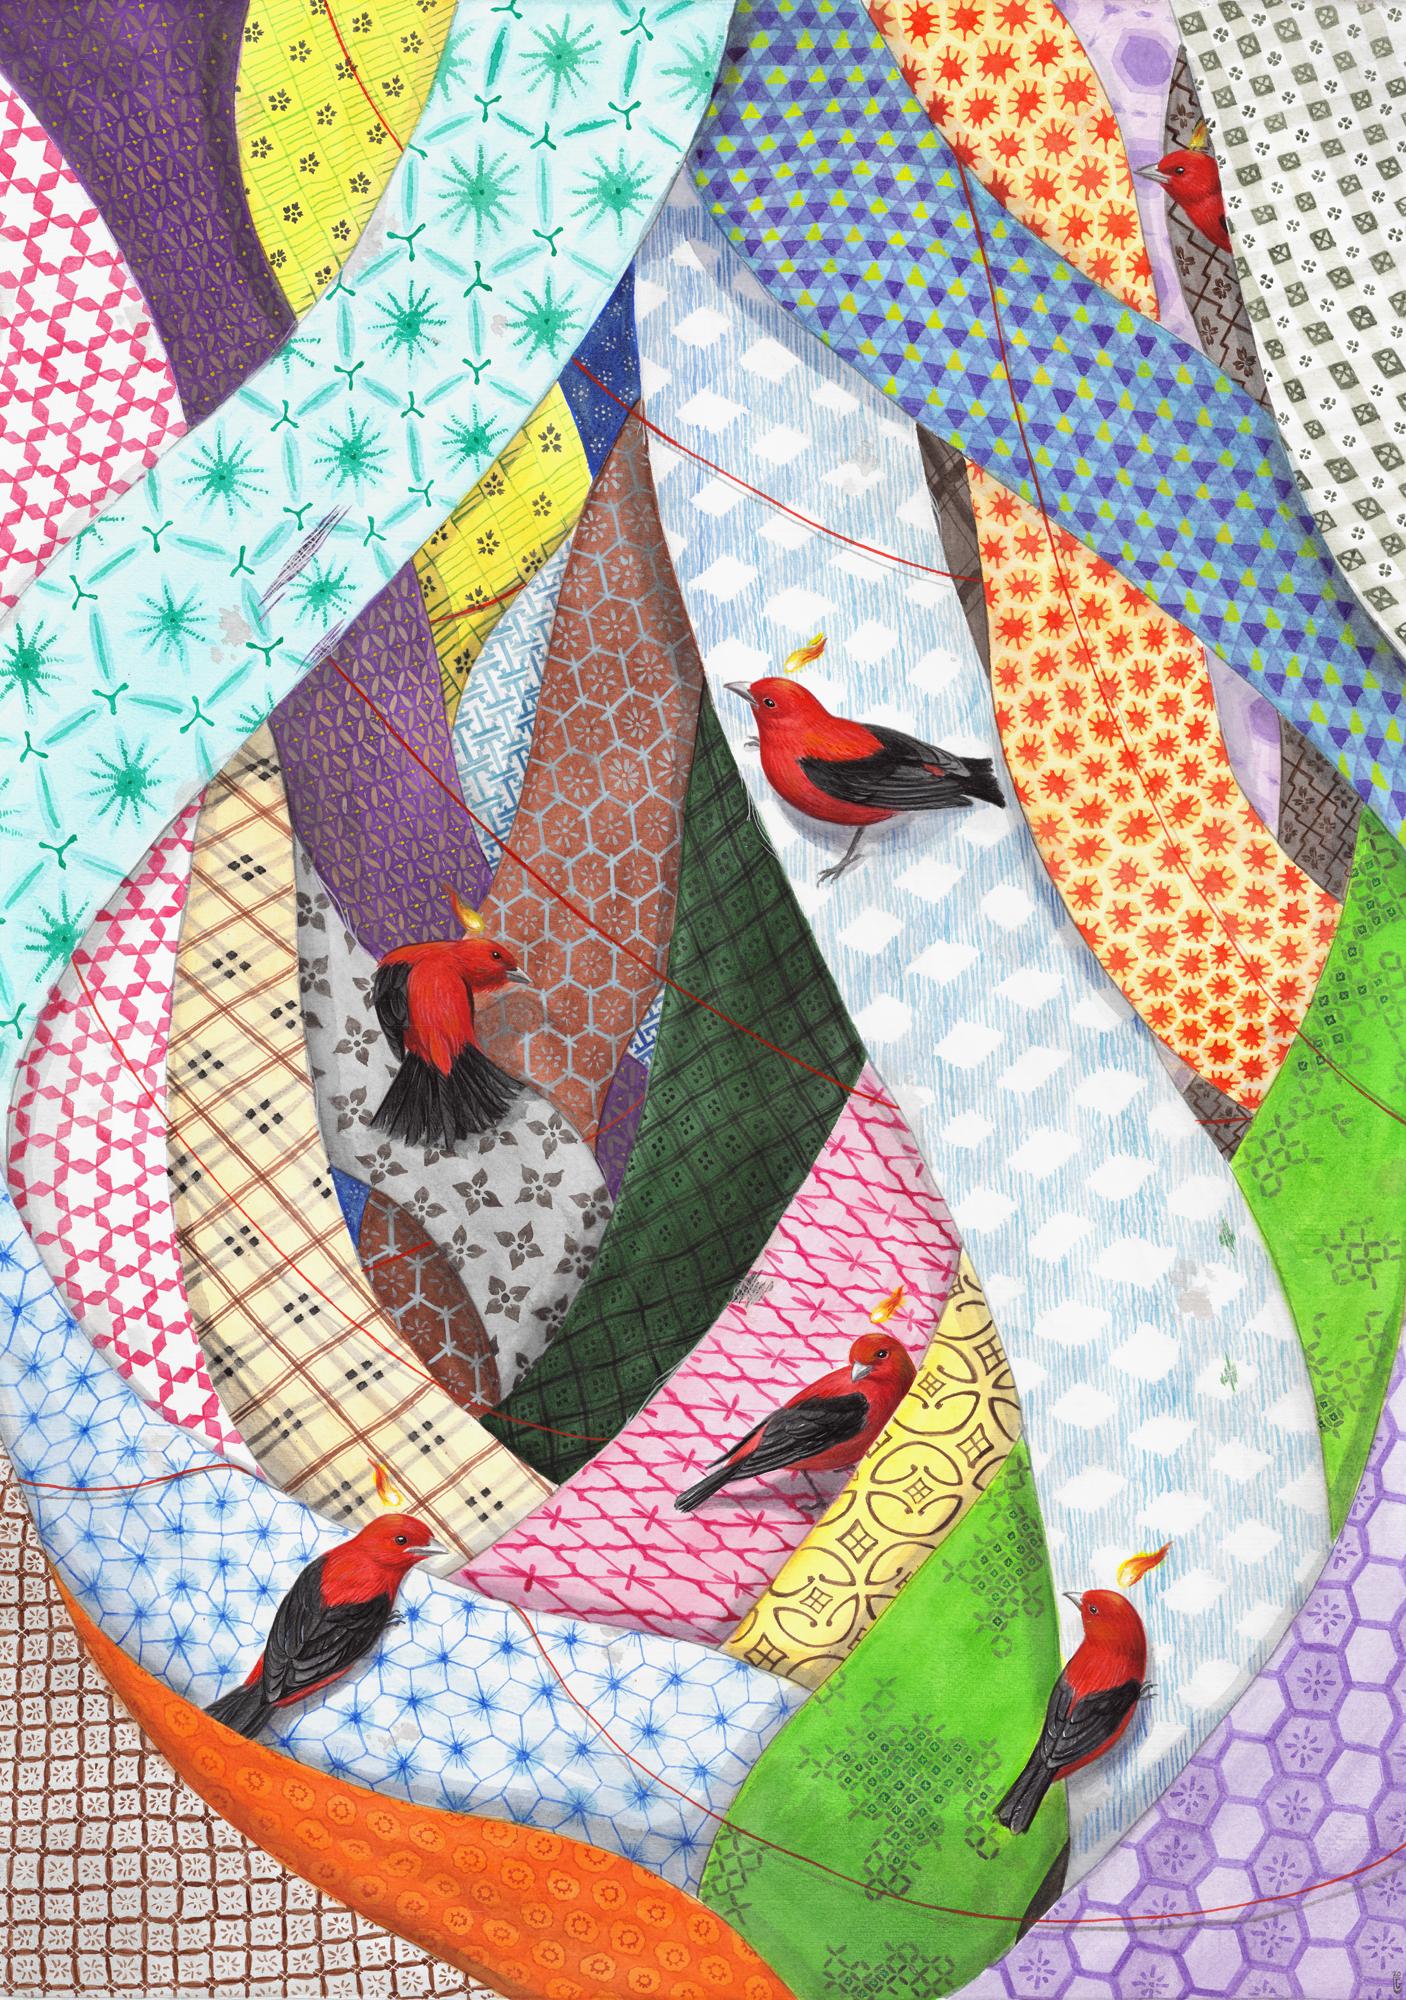 El Gato Chimney, Home, 2021, watercolor and gouache on cotton paper, 50×70 cm